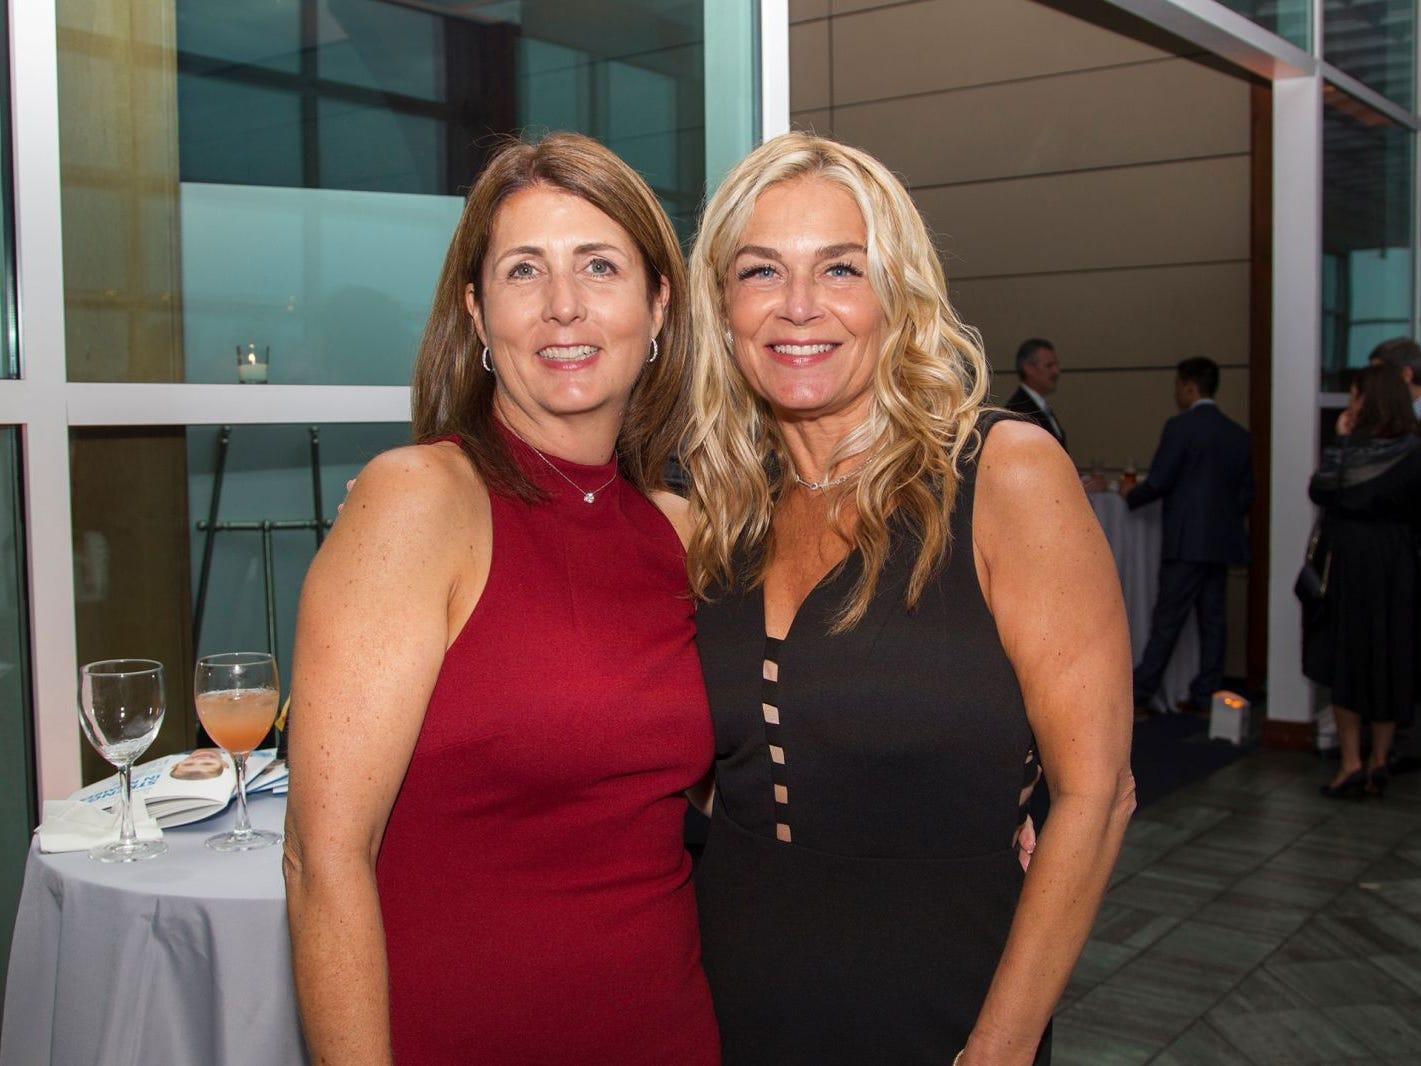 Heather Costabile, Geri Oppler. 11th annual IronMatt Fundraiser Gala at Pier 60 Chelsea Piers. 09/20/2018